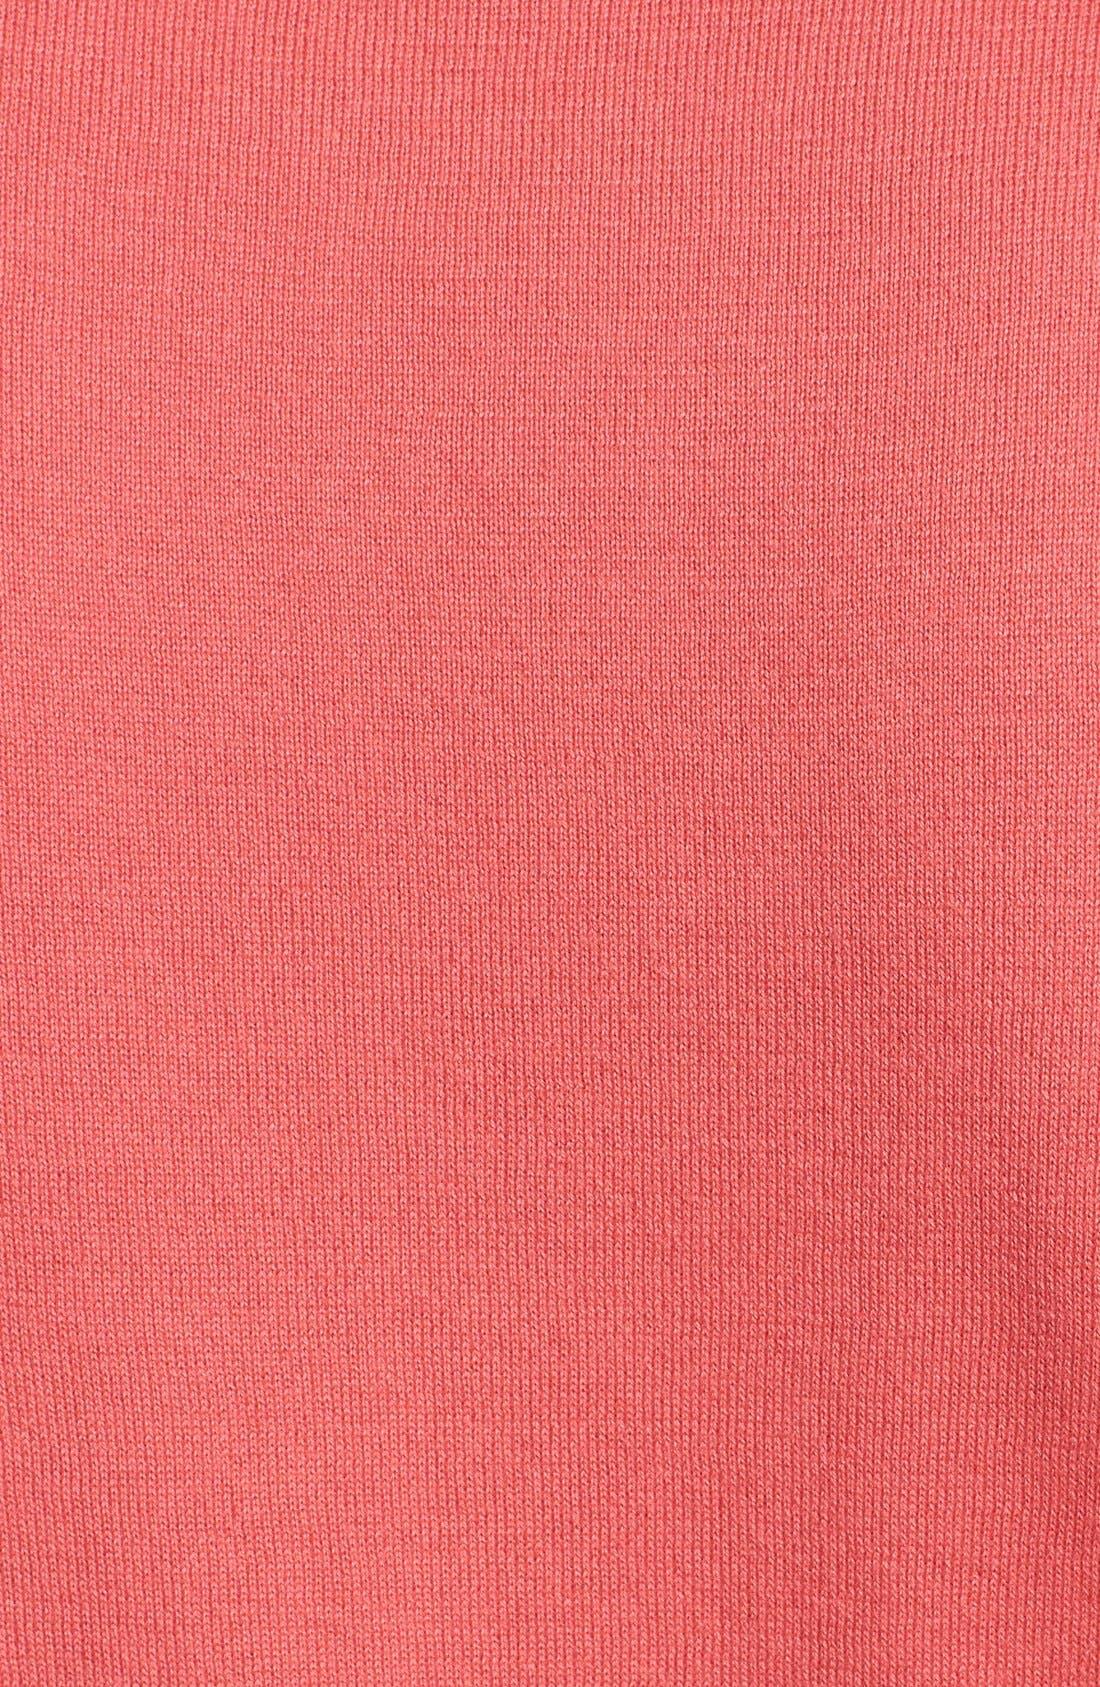 Alternate Image 3  - Burberry 'Arnal' Crewneck Sweater